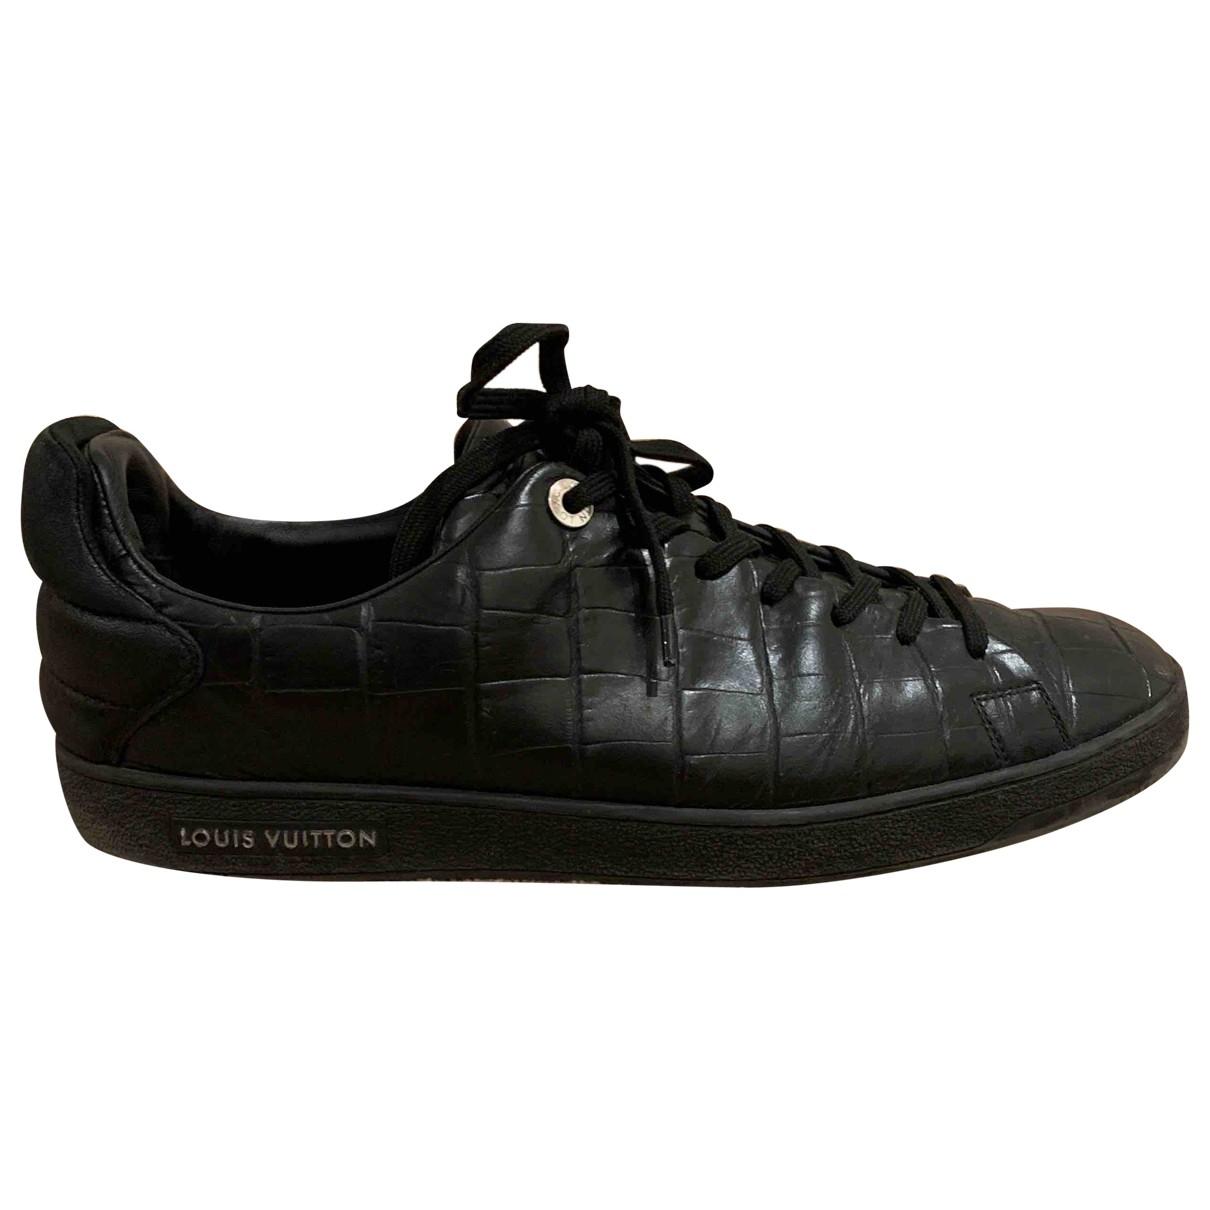 Louis Vuitton Frontrow Black Leather Trainers for Men 44 EU